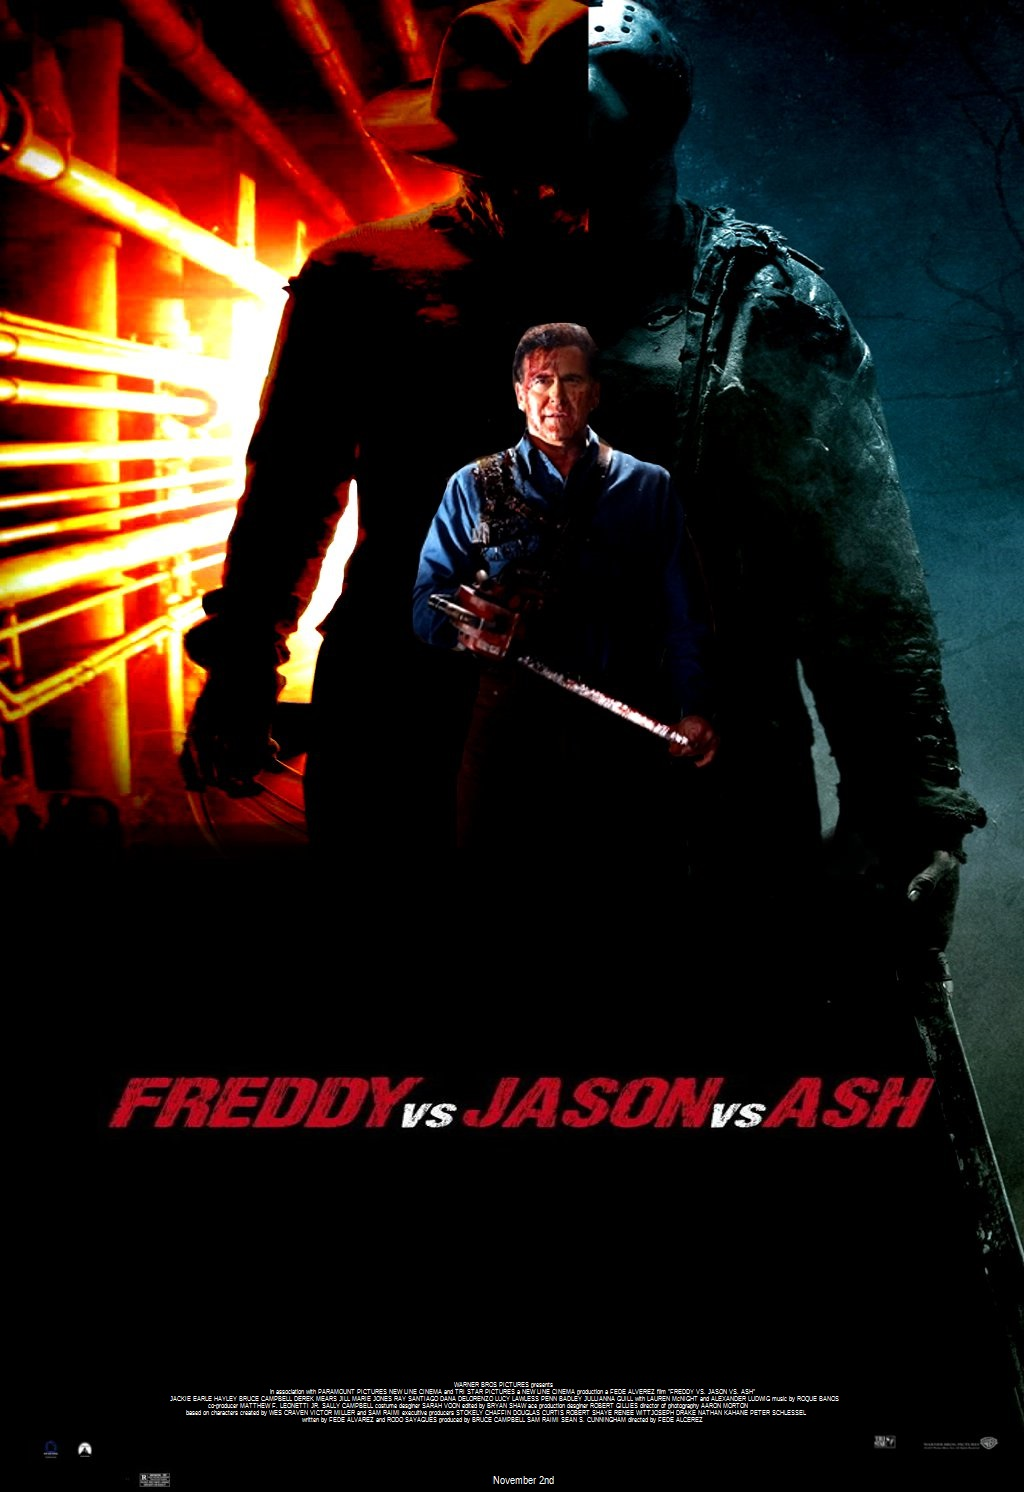 freddy vs jason vs ash movie poster by steveirwinfan96 on